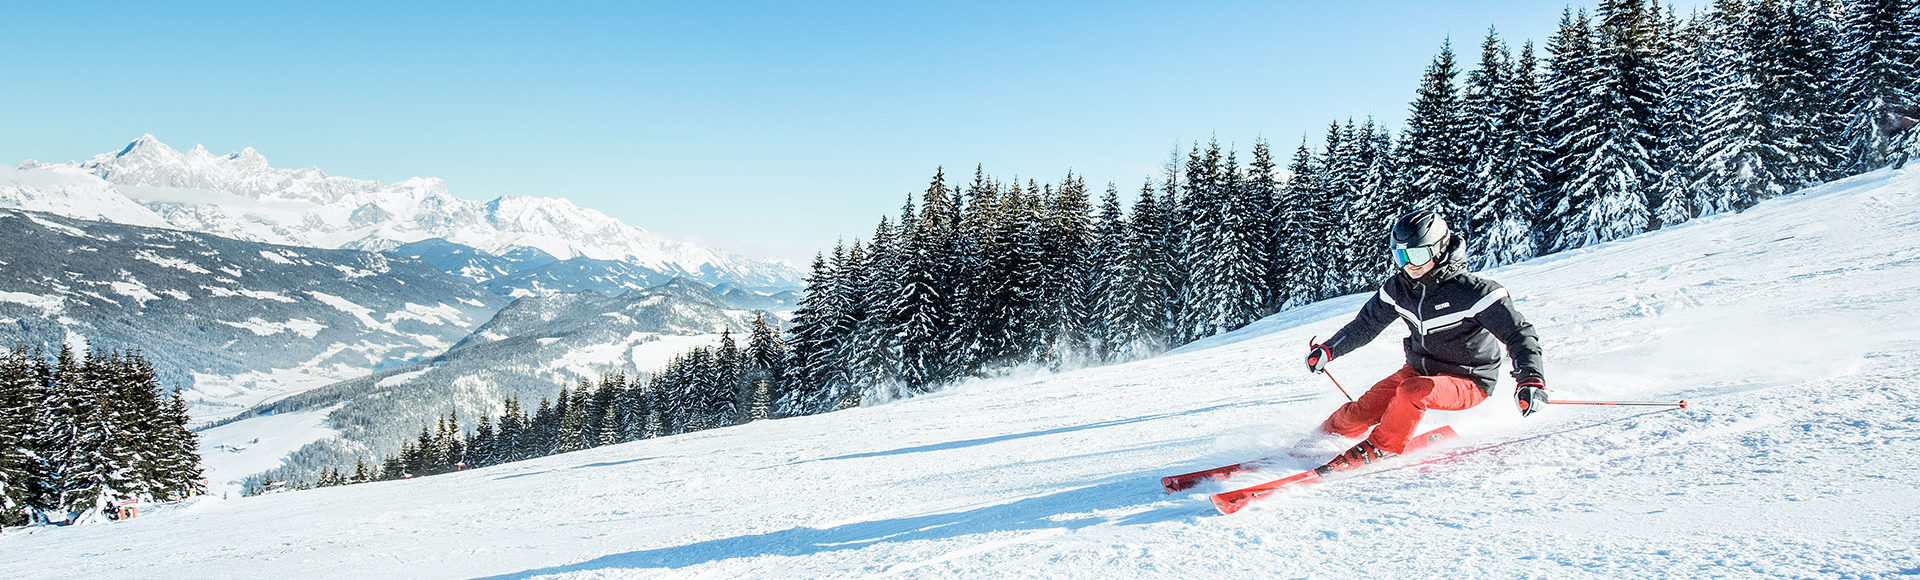 Skifahren im Skiurlaub in Radstadt, Ski amadé